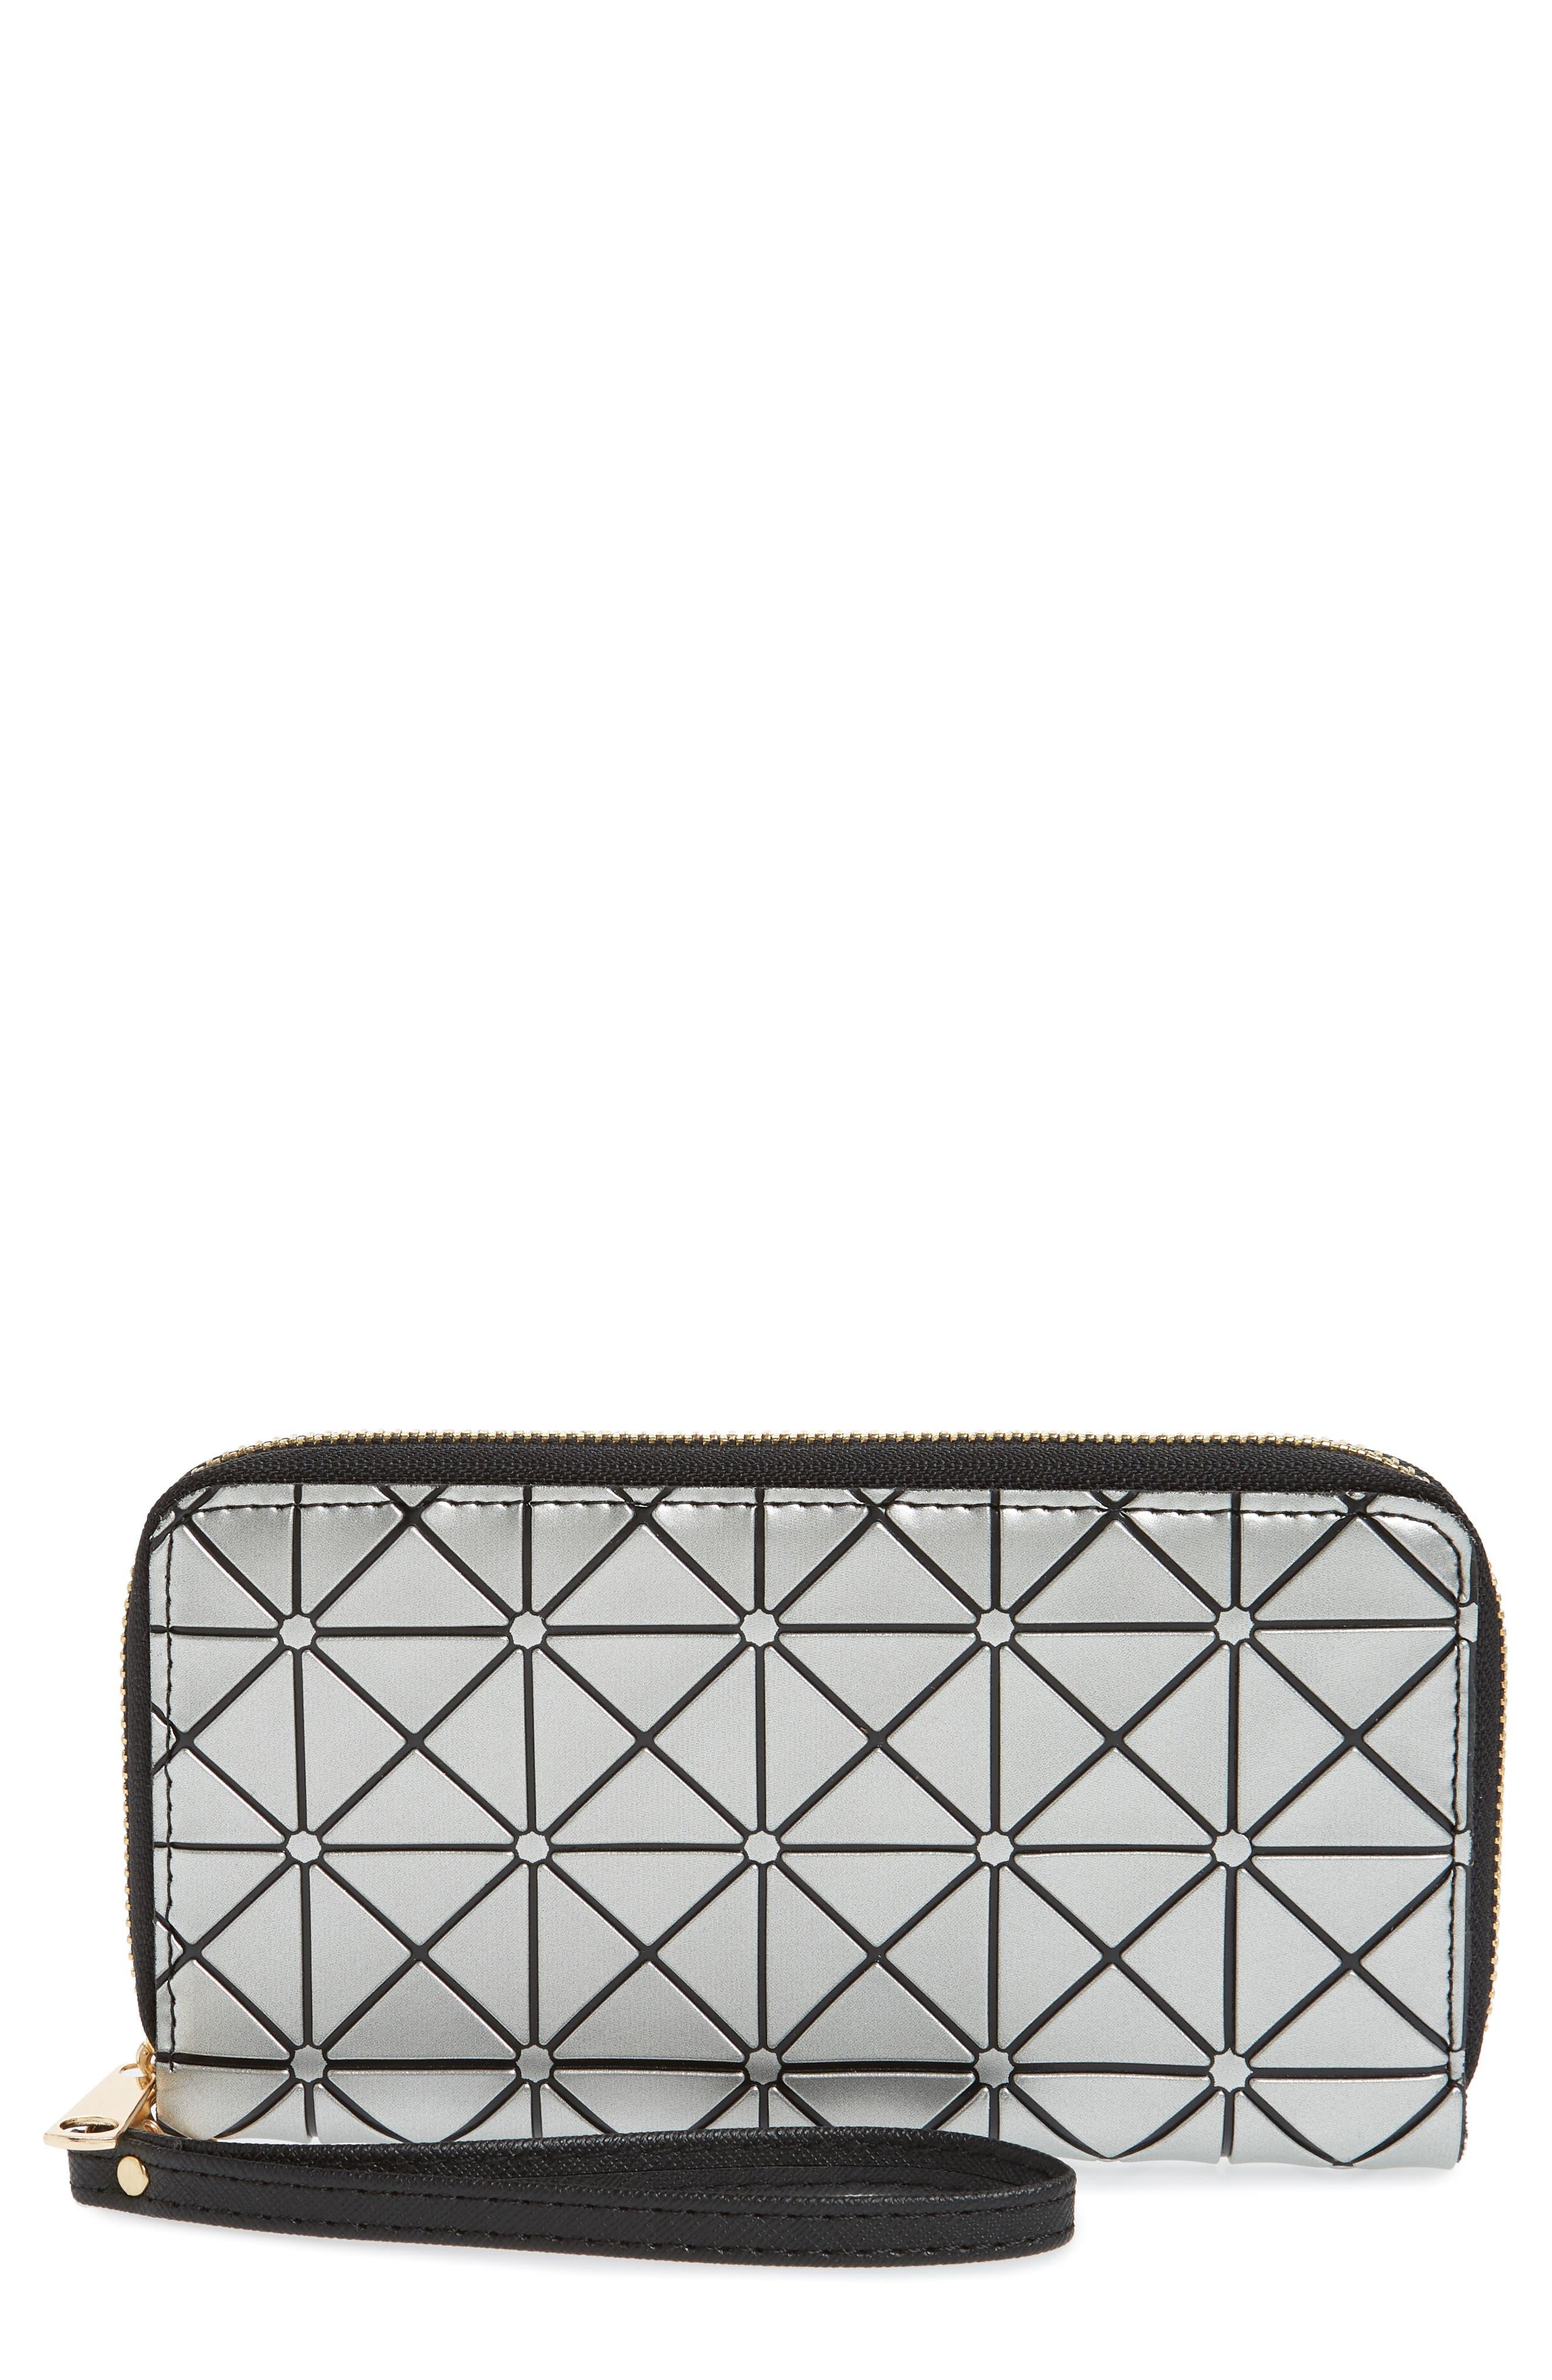 YOKI BAGS, Diamond Embossed Faux Leather Zip Wallet, Main thumbnail 1, color, 040